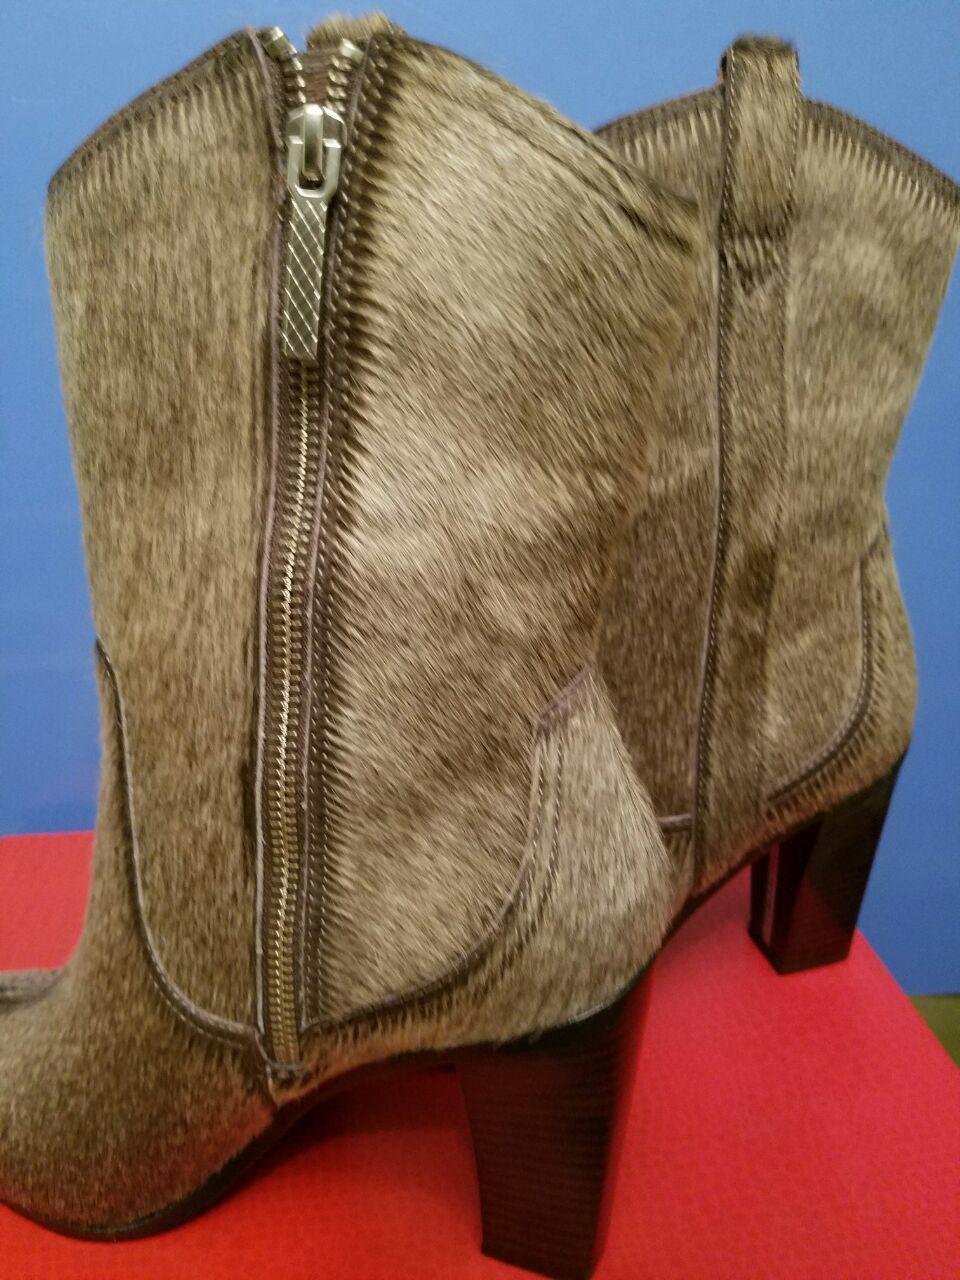 NIB Donald J Pliner Olivia Olivia Olivia ZJ Taupe Cowboy Haircalf Leather Boots 8M 8.5M  398 b39b96